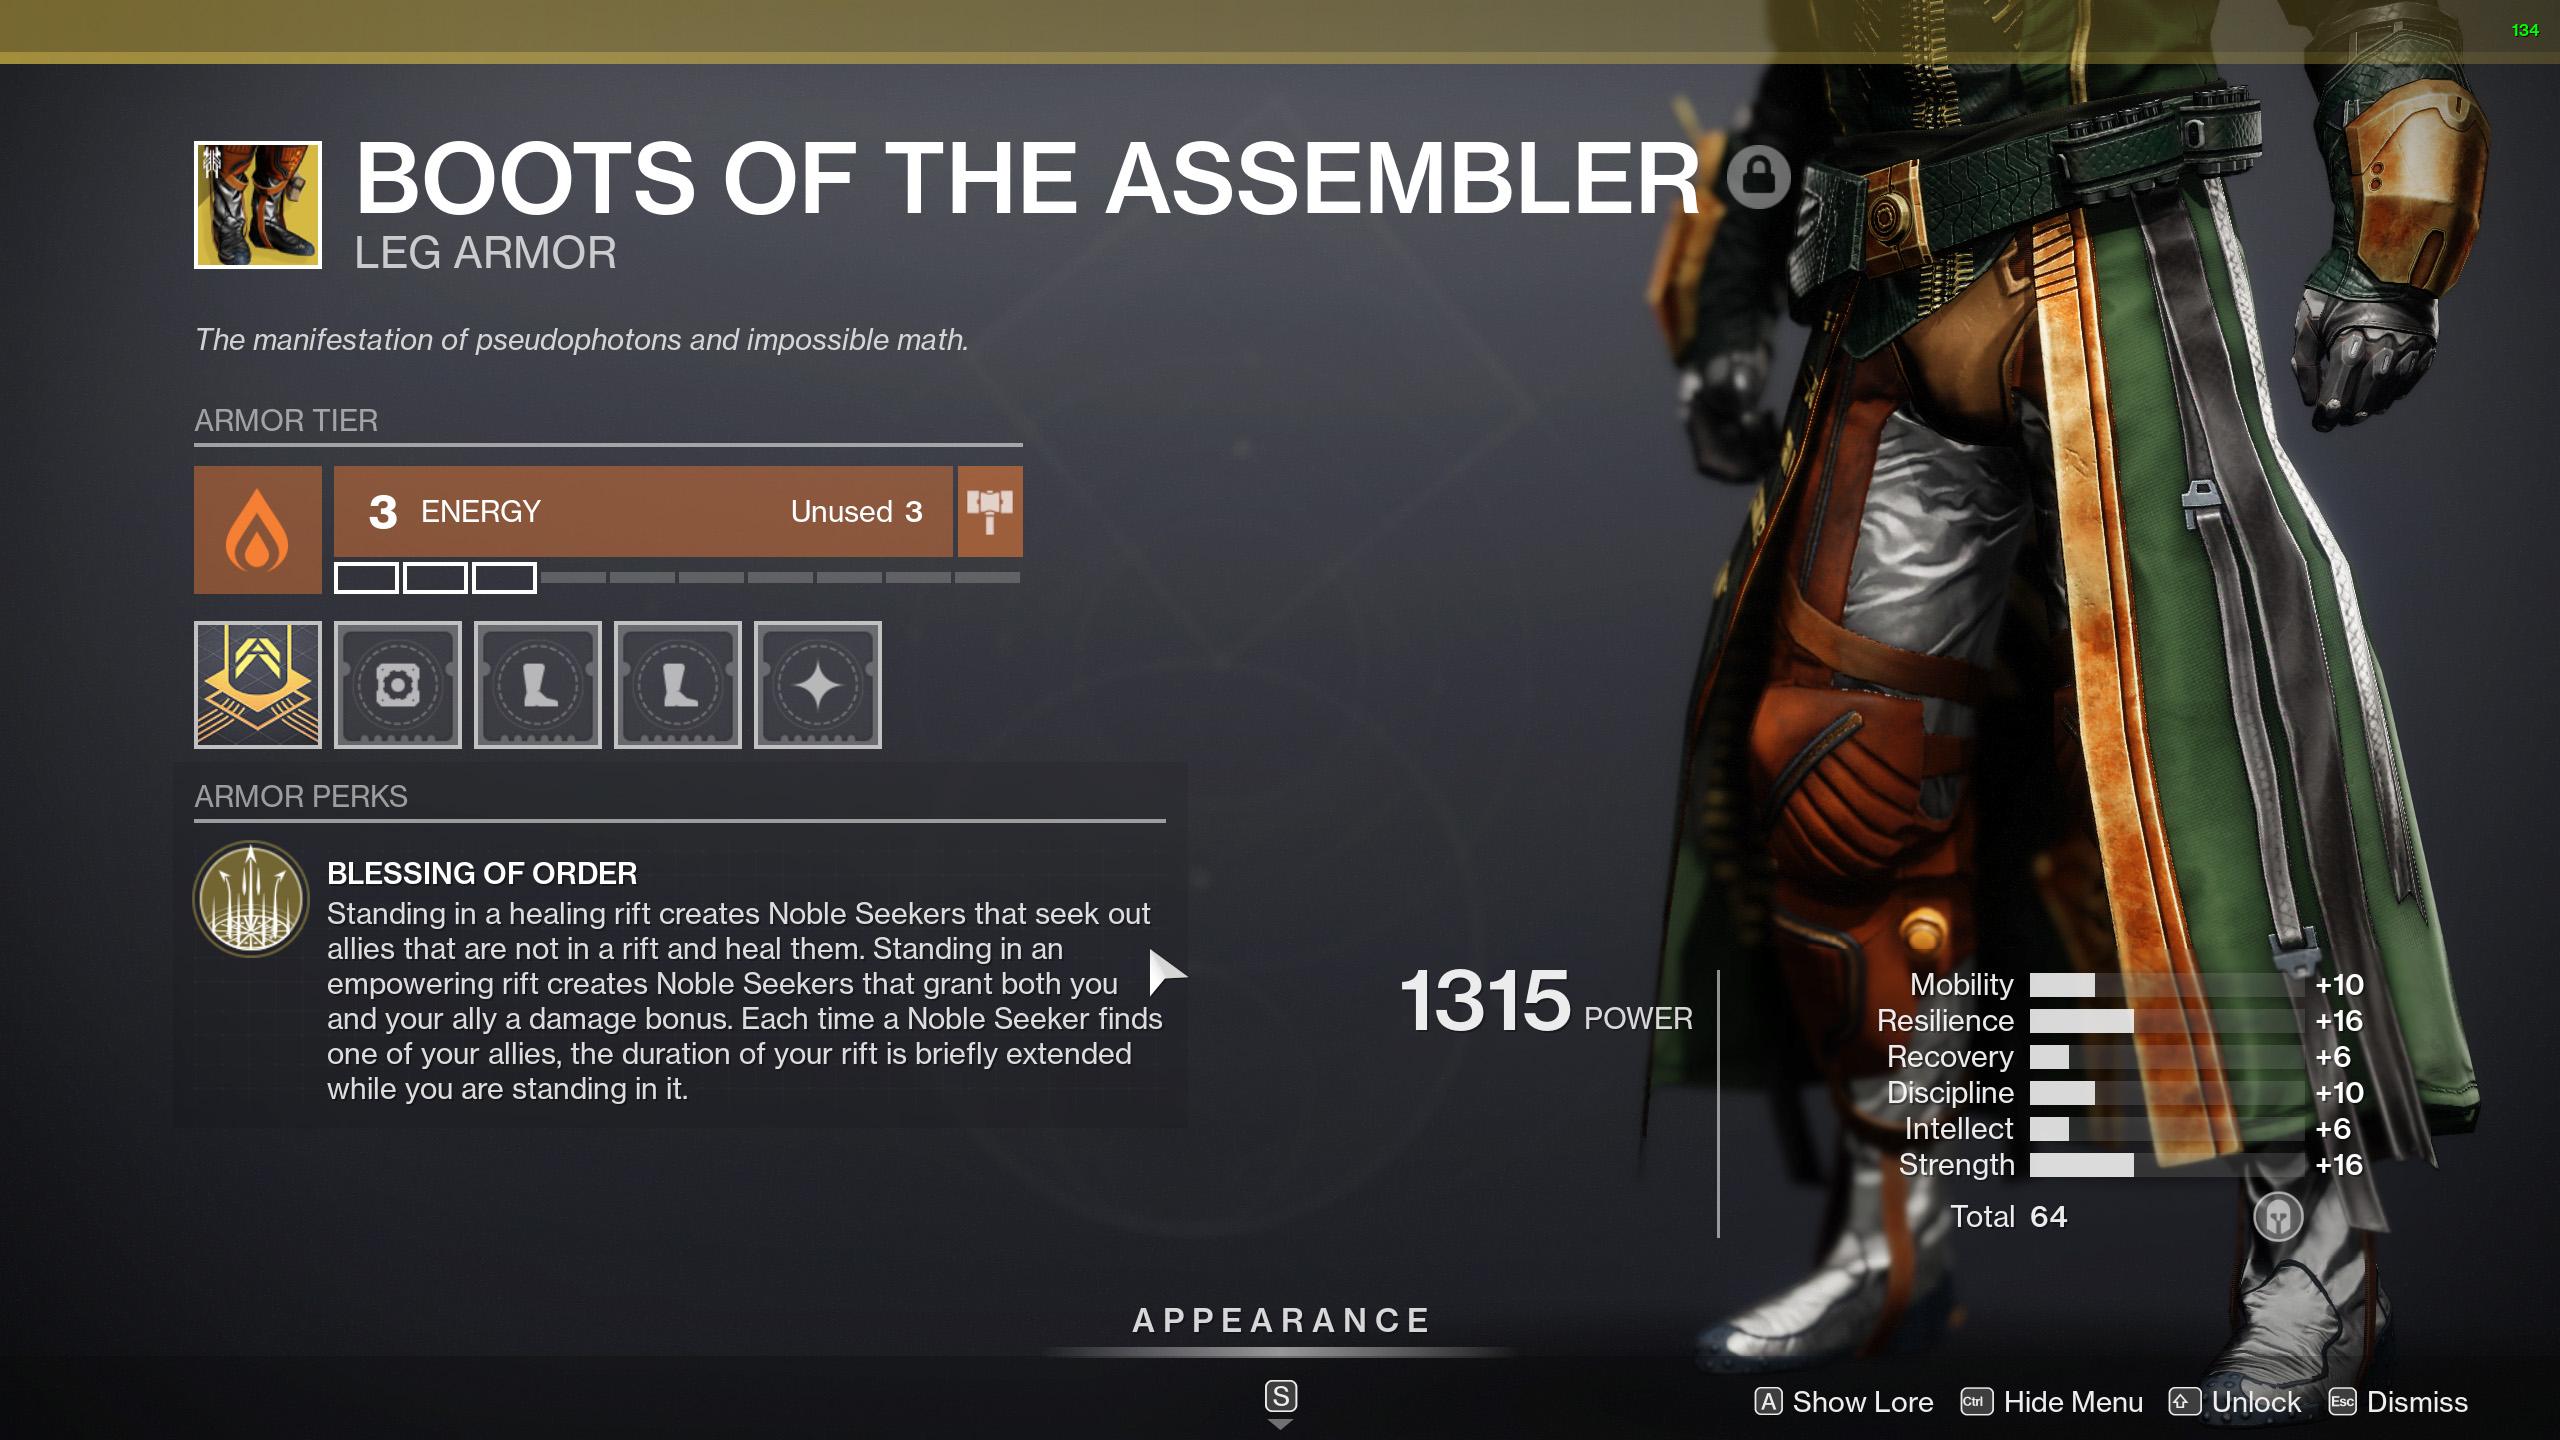 destiny 2 boots of the assembler perk blessing of order